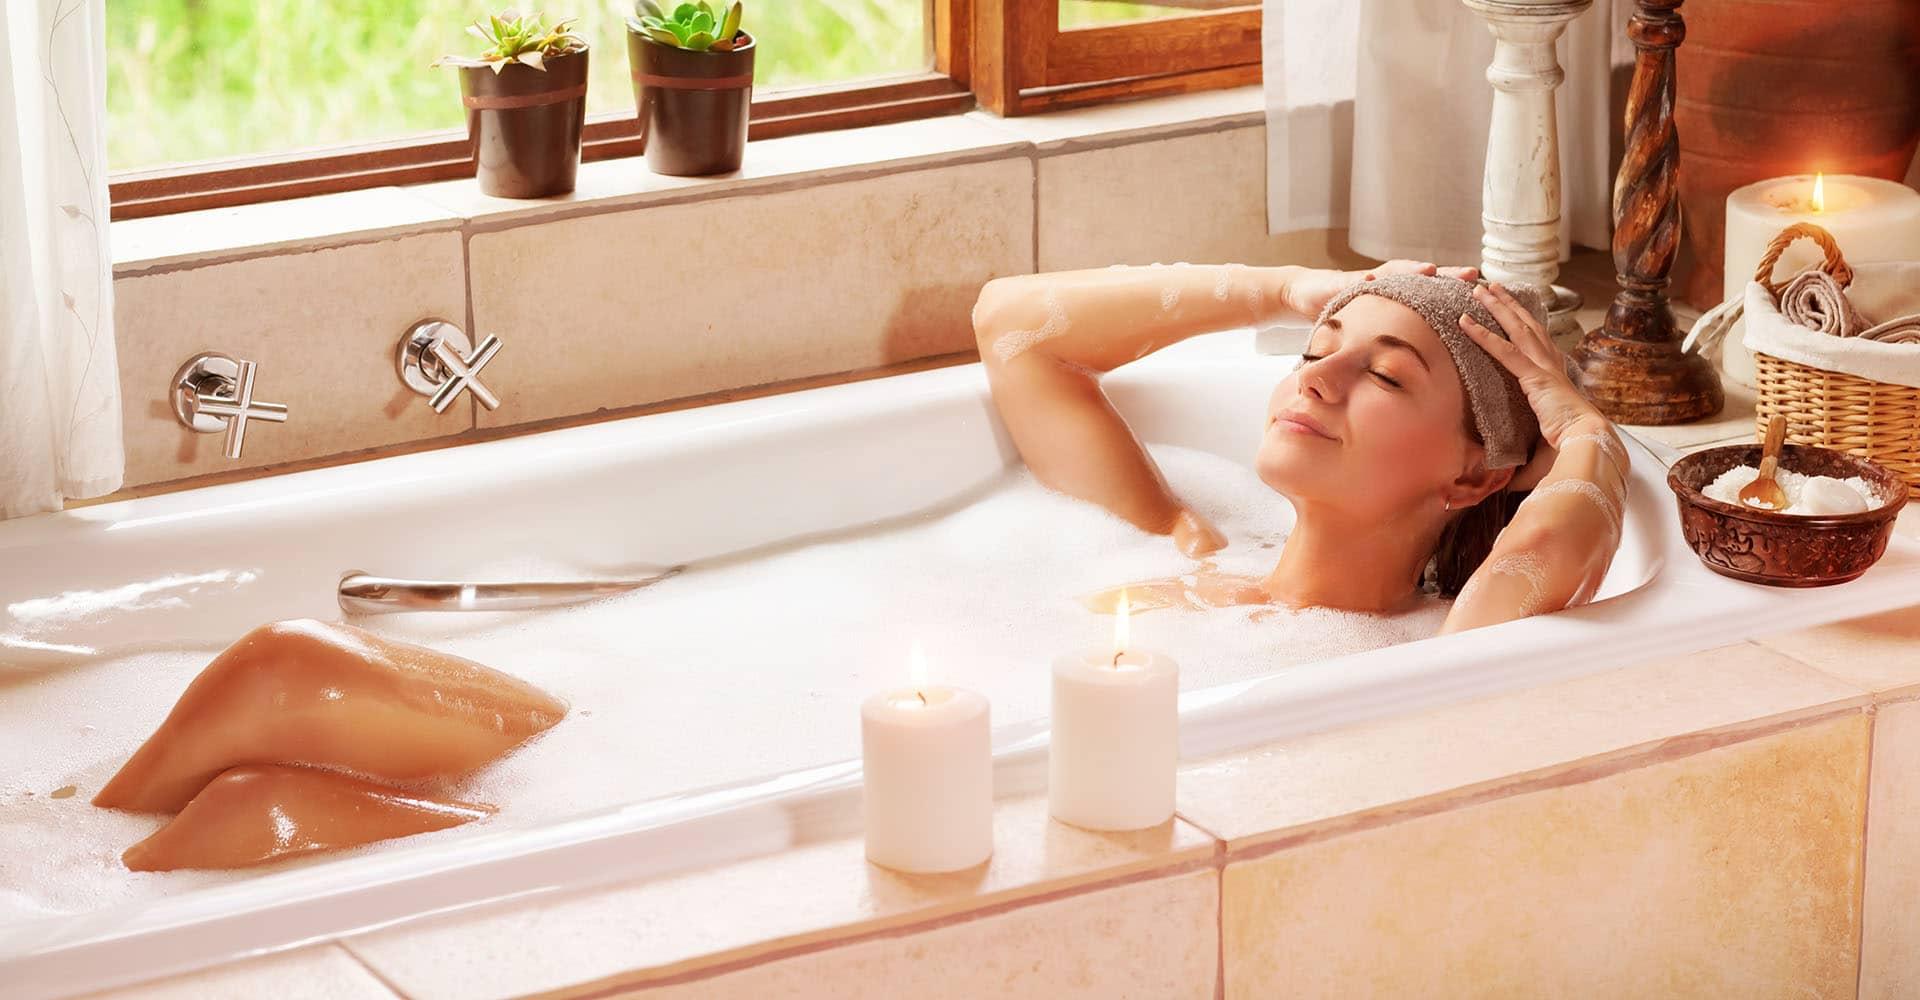 Frau entspannt auf Whirlpoolmatte in Badewanne